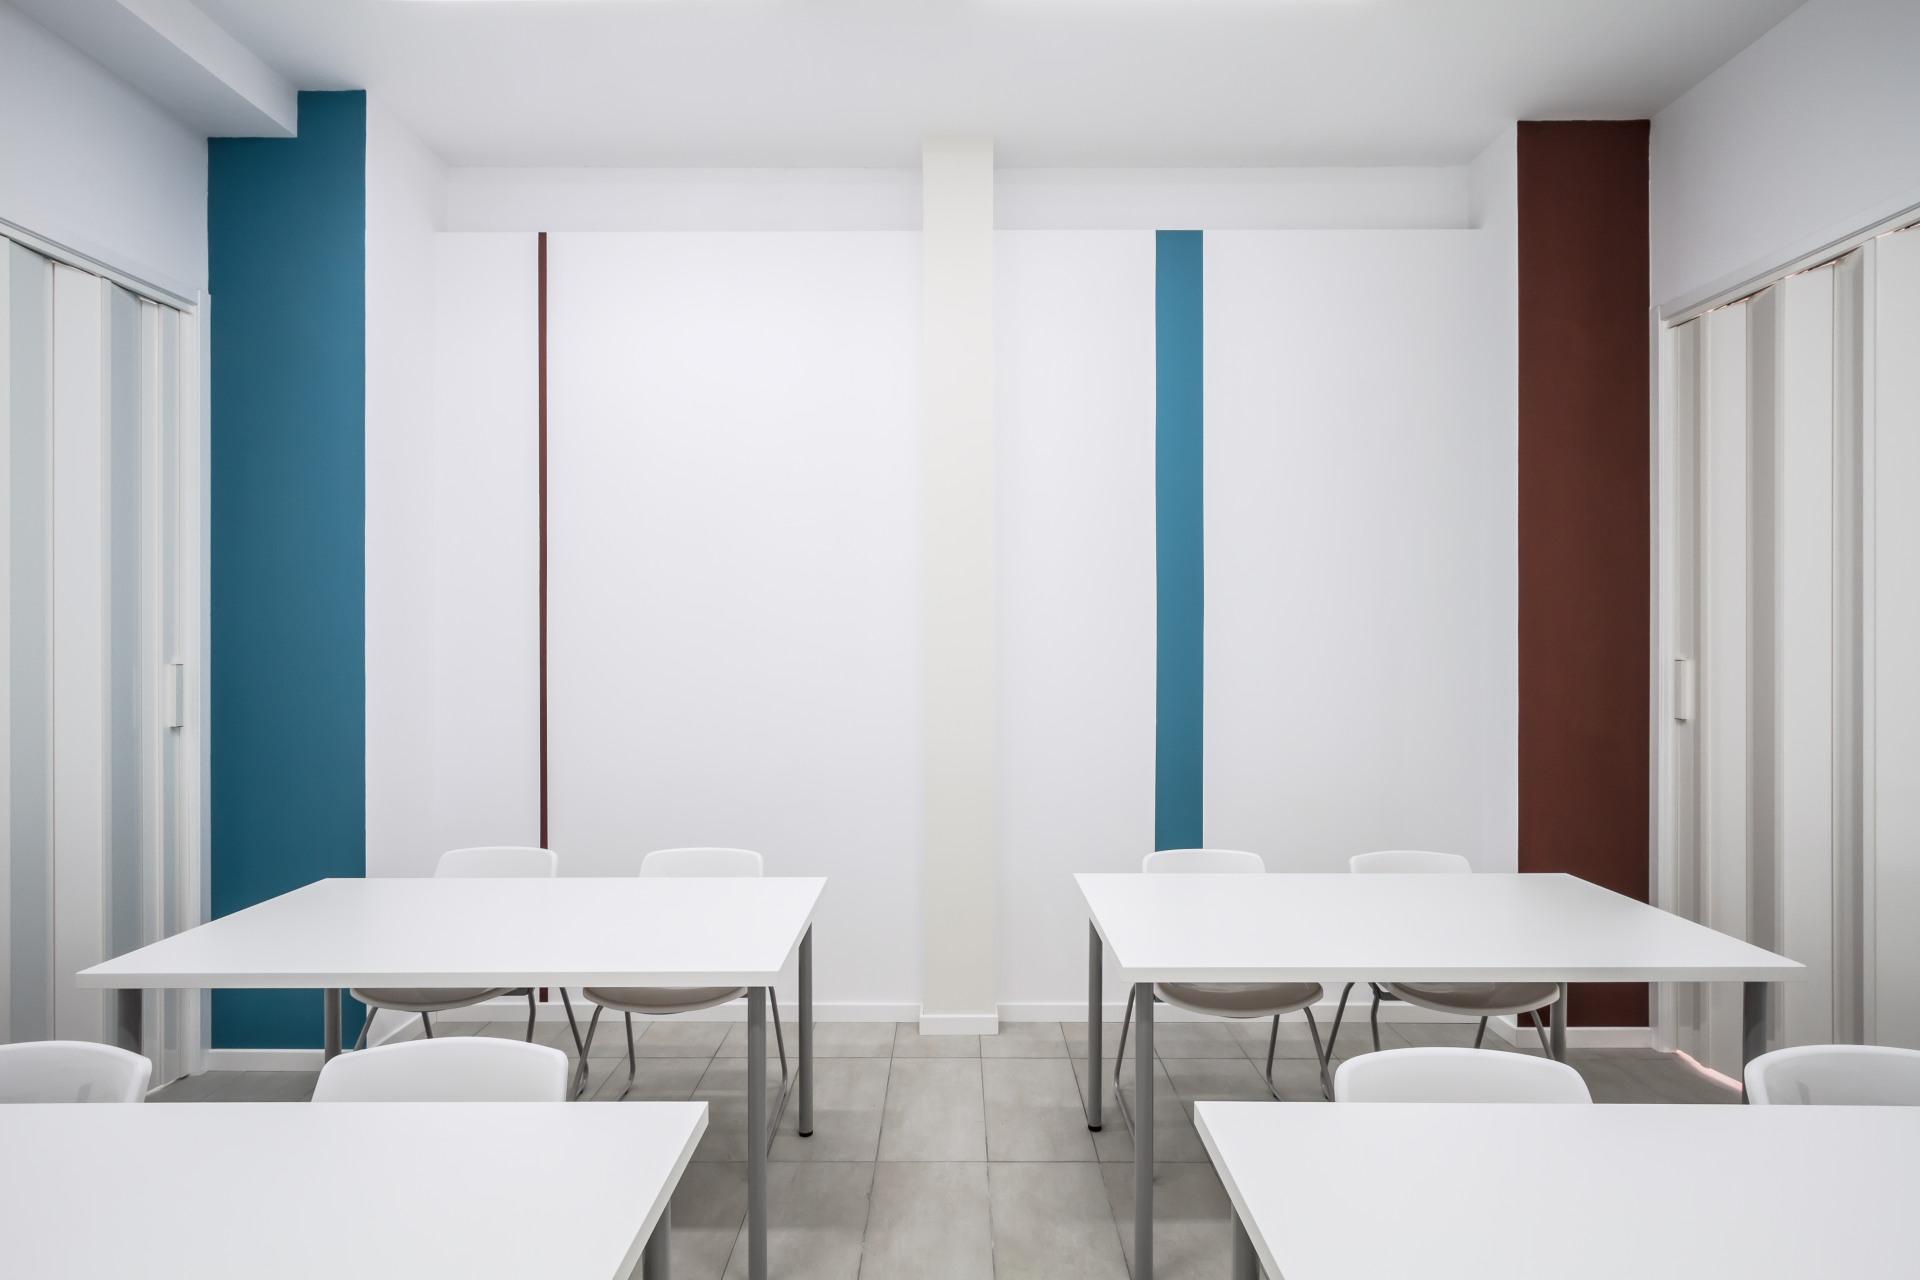 fotografia-arquitectura-valencia-german-cabo-viraje-atelier (4)